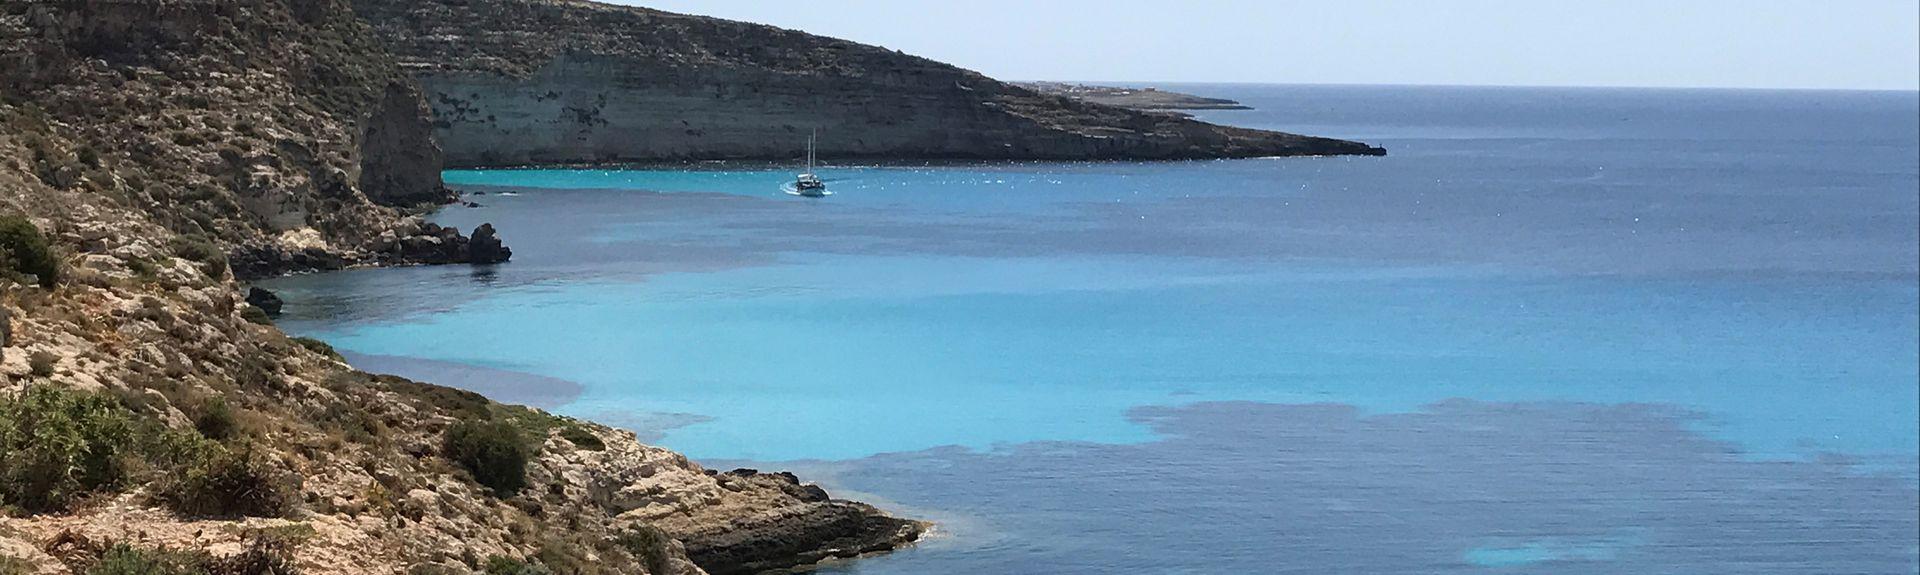 Lampedusa e Linosa, Sicília, Itália